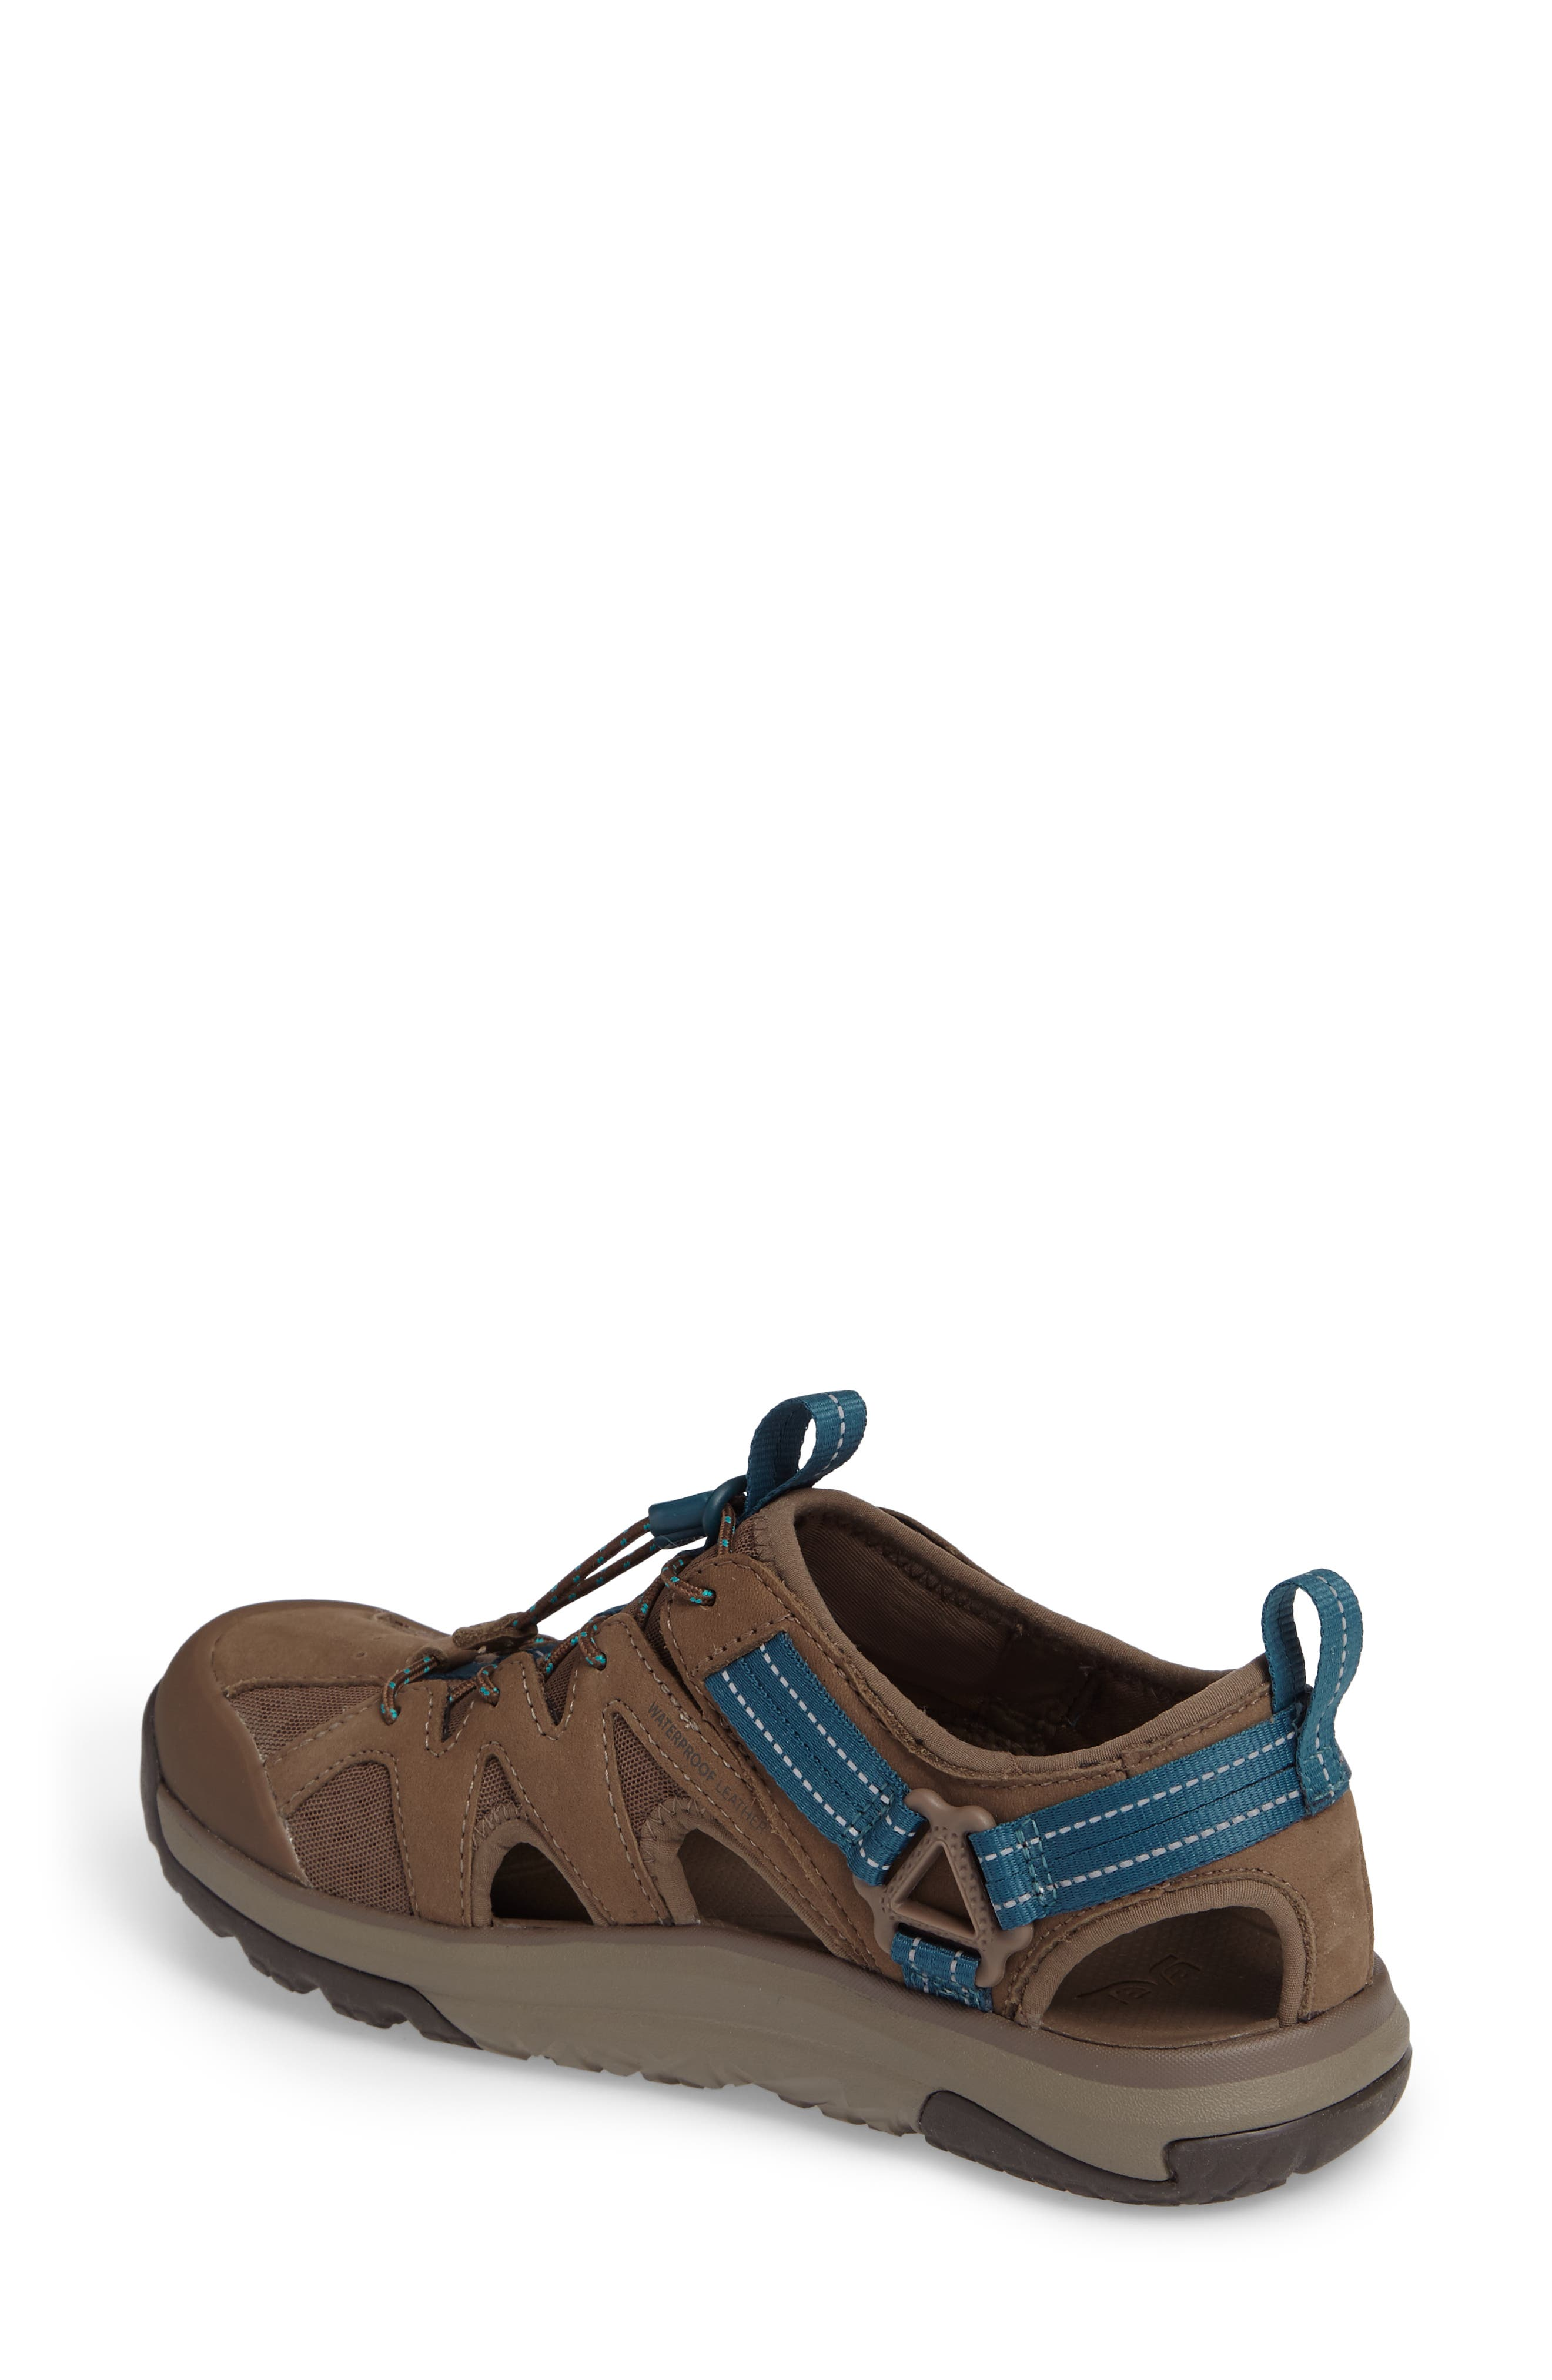 Terra Float Active Sandal,                             Alternate thumbnail 7, color,